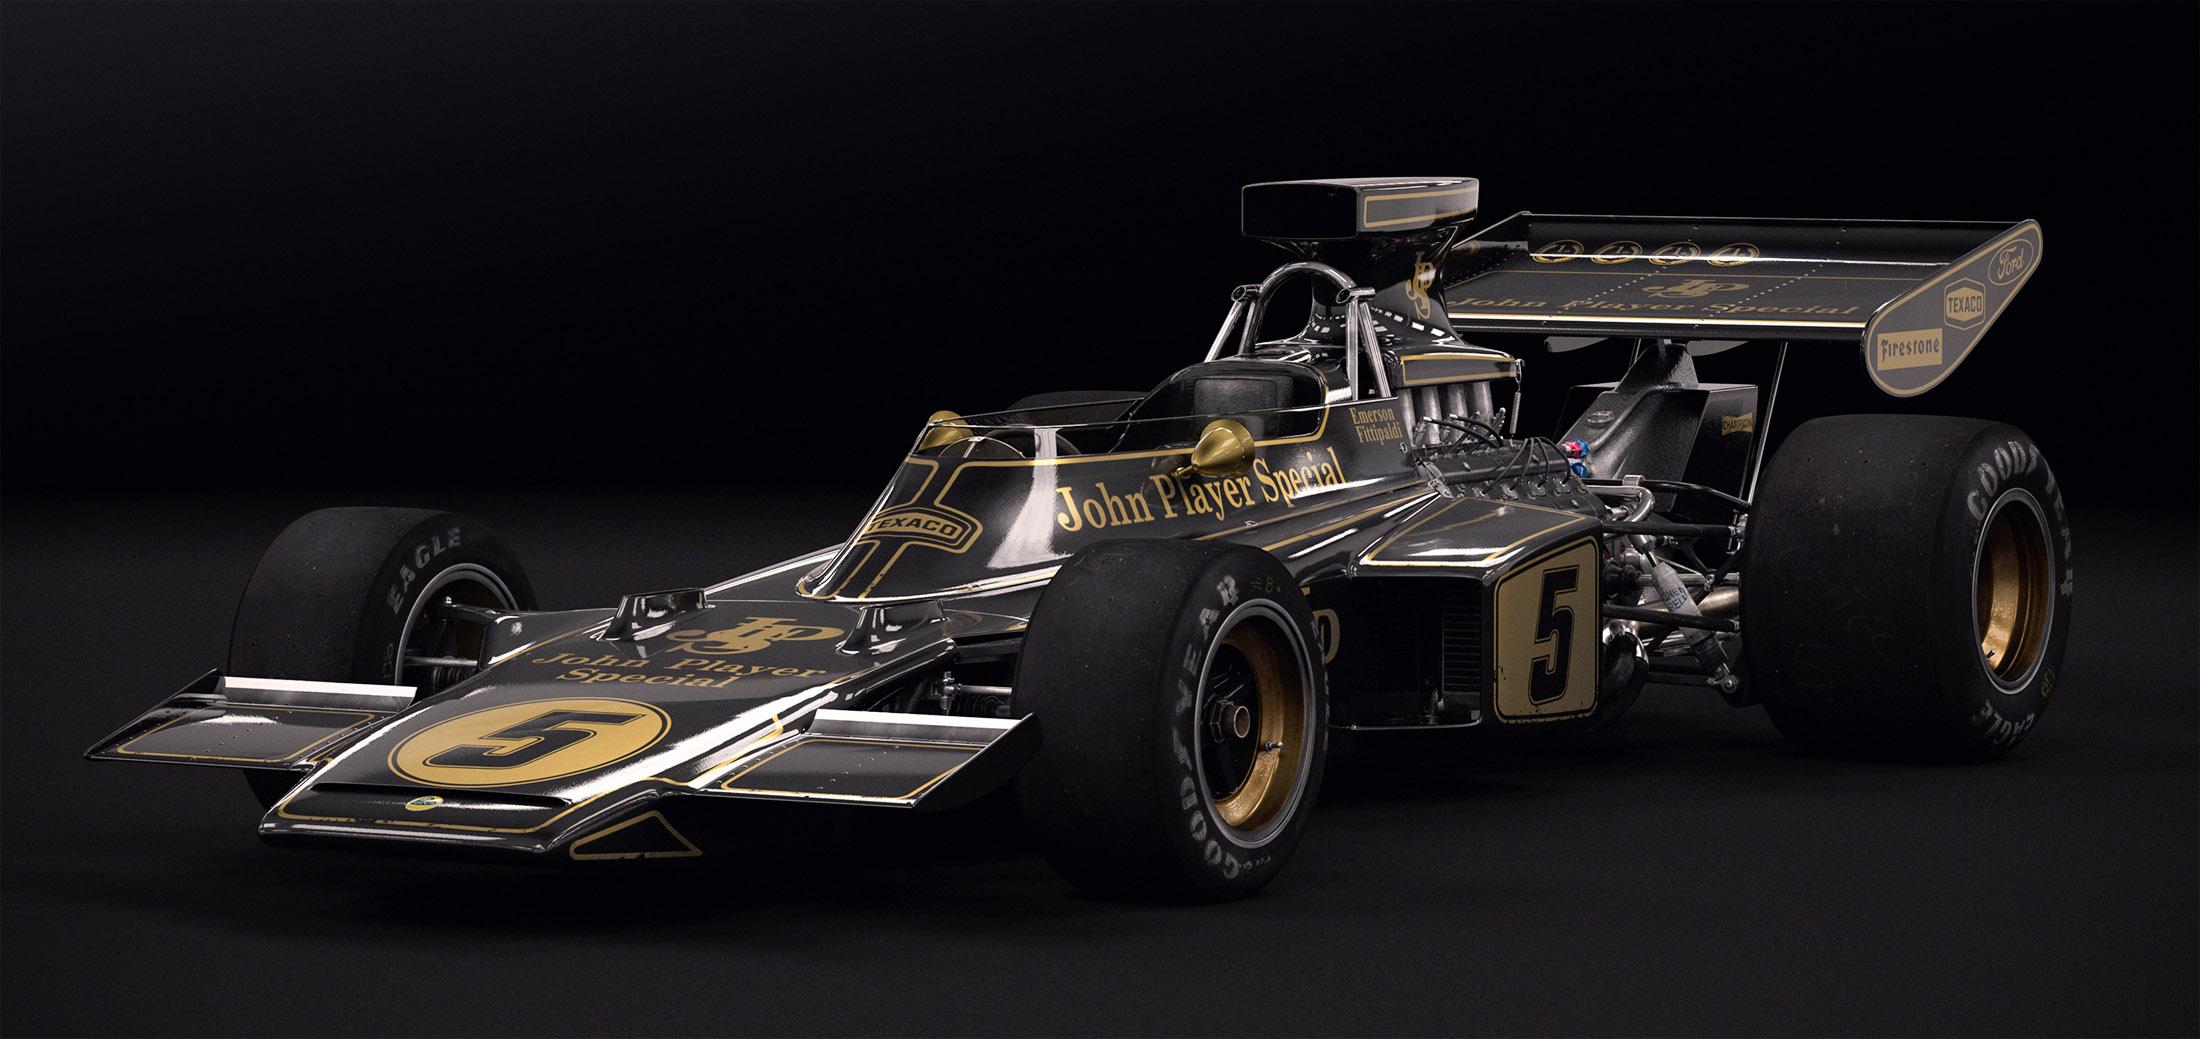 Lotus 72D Studio by Laffonte